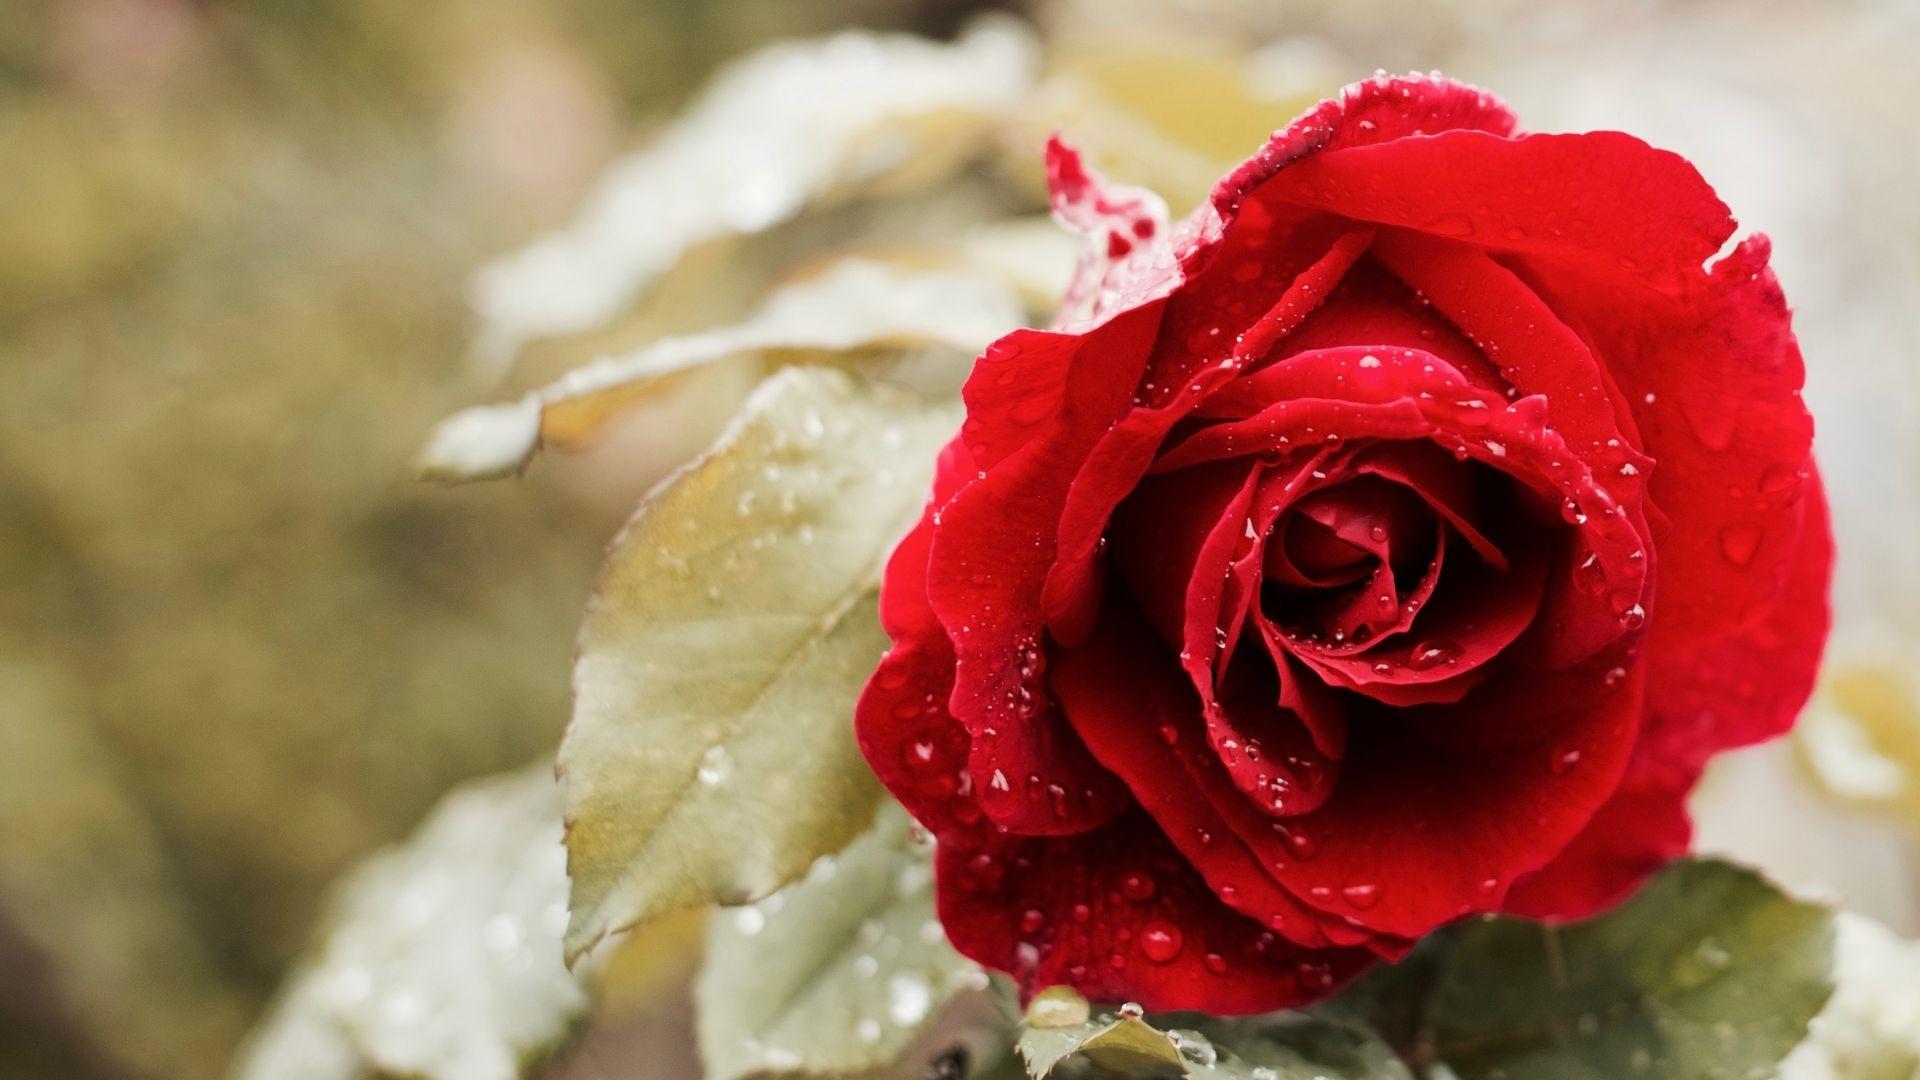 Red Flower wallpaper photo hd